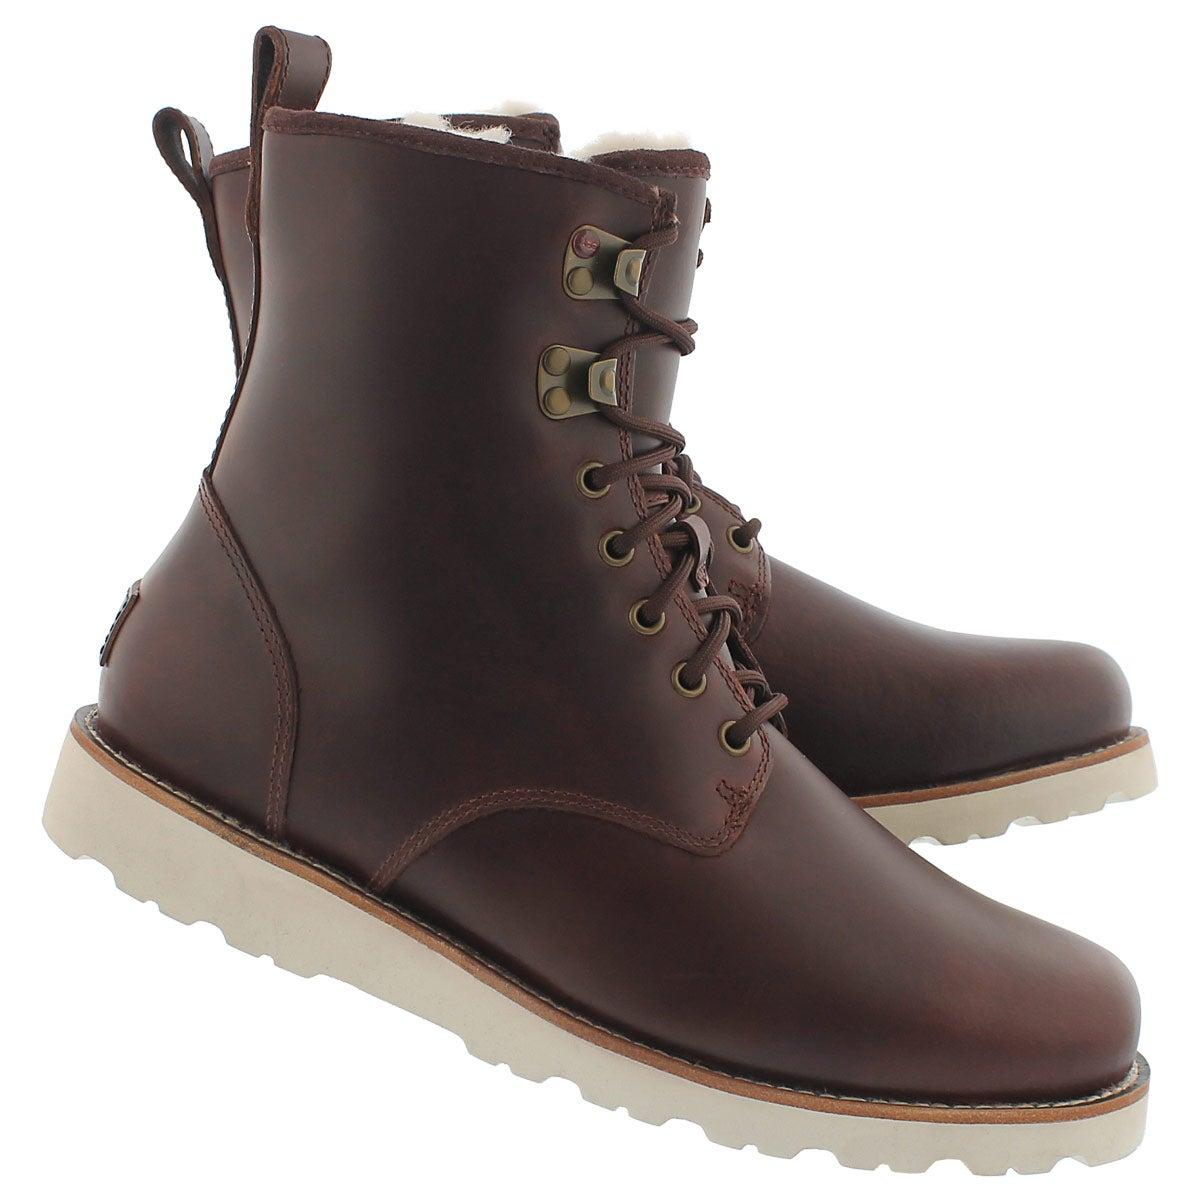 Mns Hannen crdv lthr wtpf casual boot